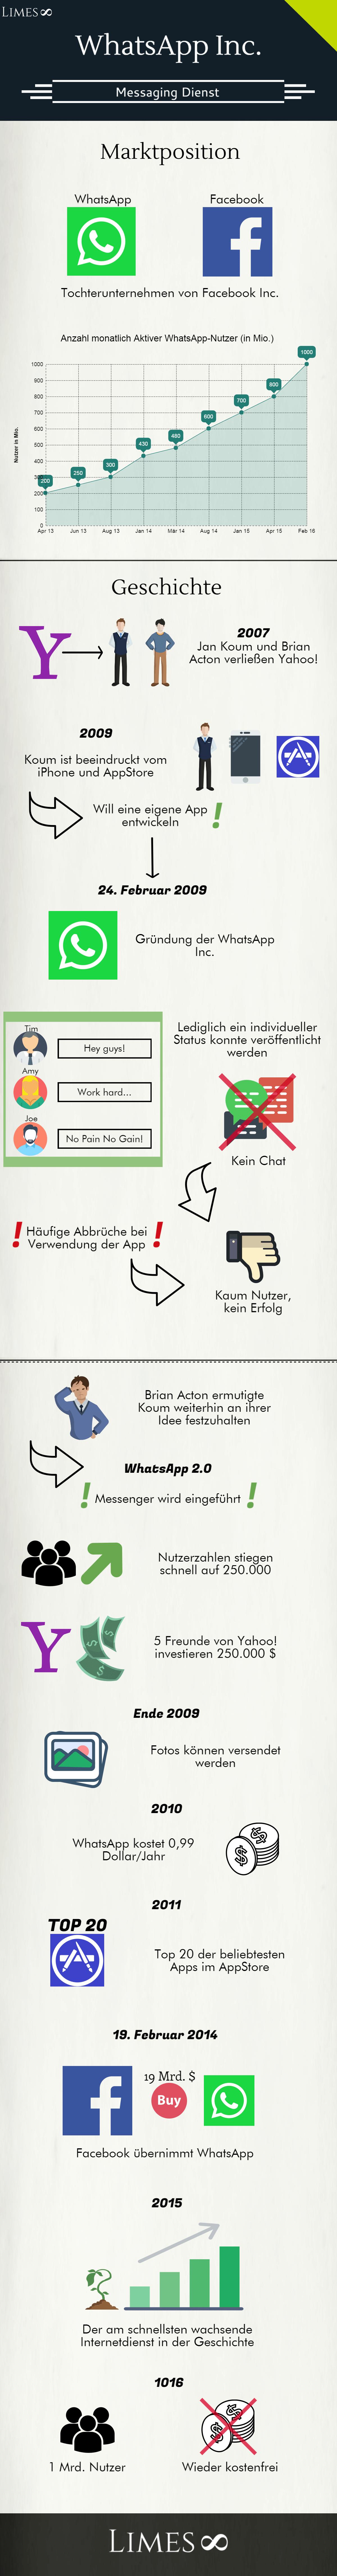 Infografik über WhatsApp